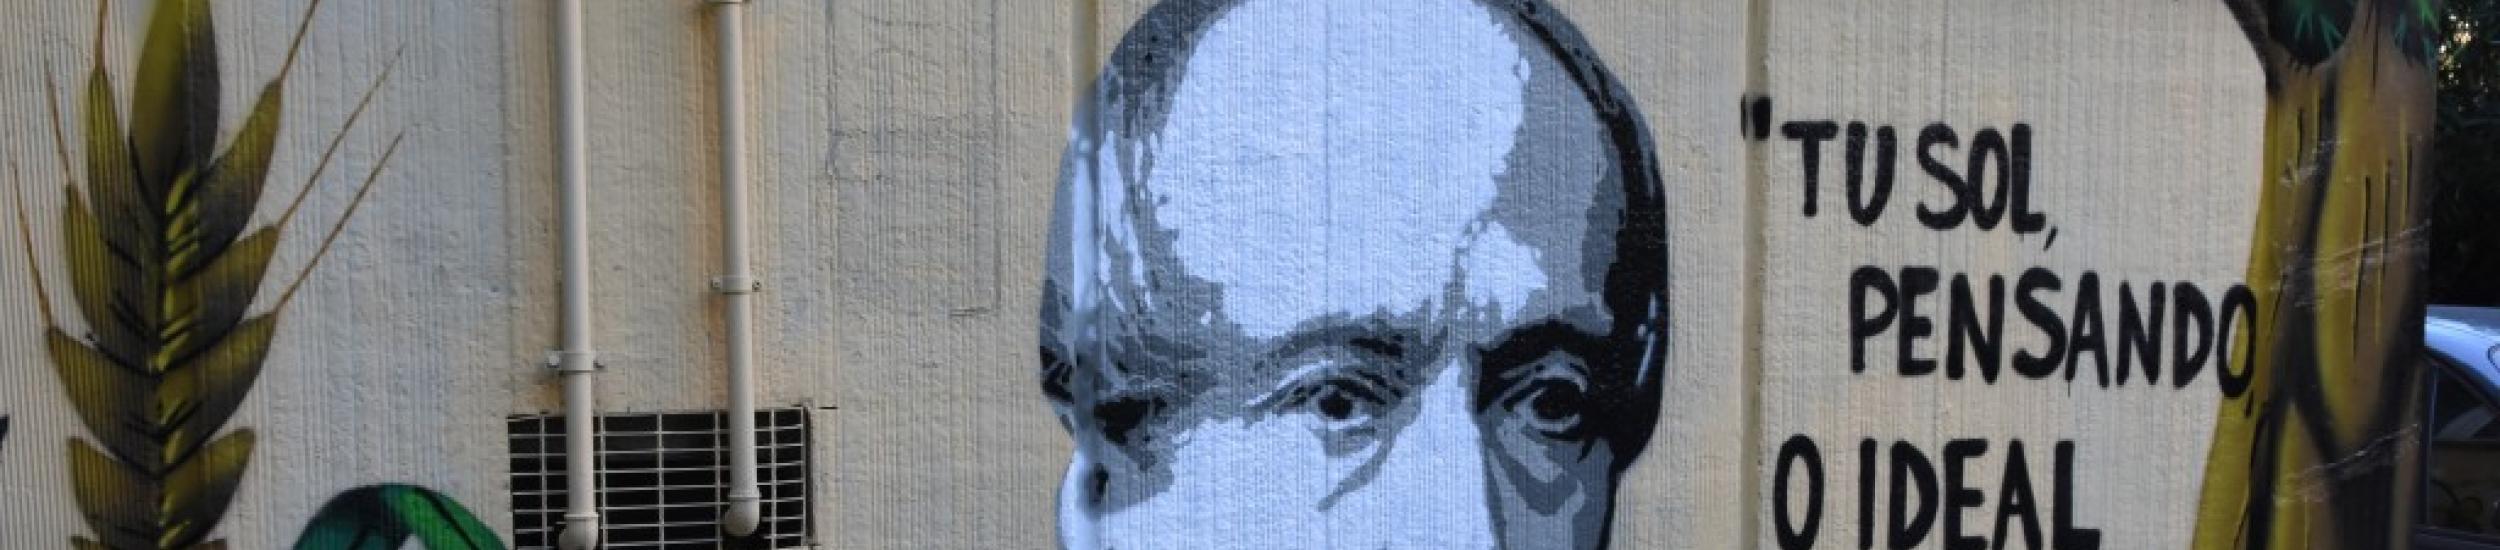 Murales ist Mazzini foto 4